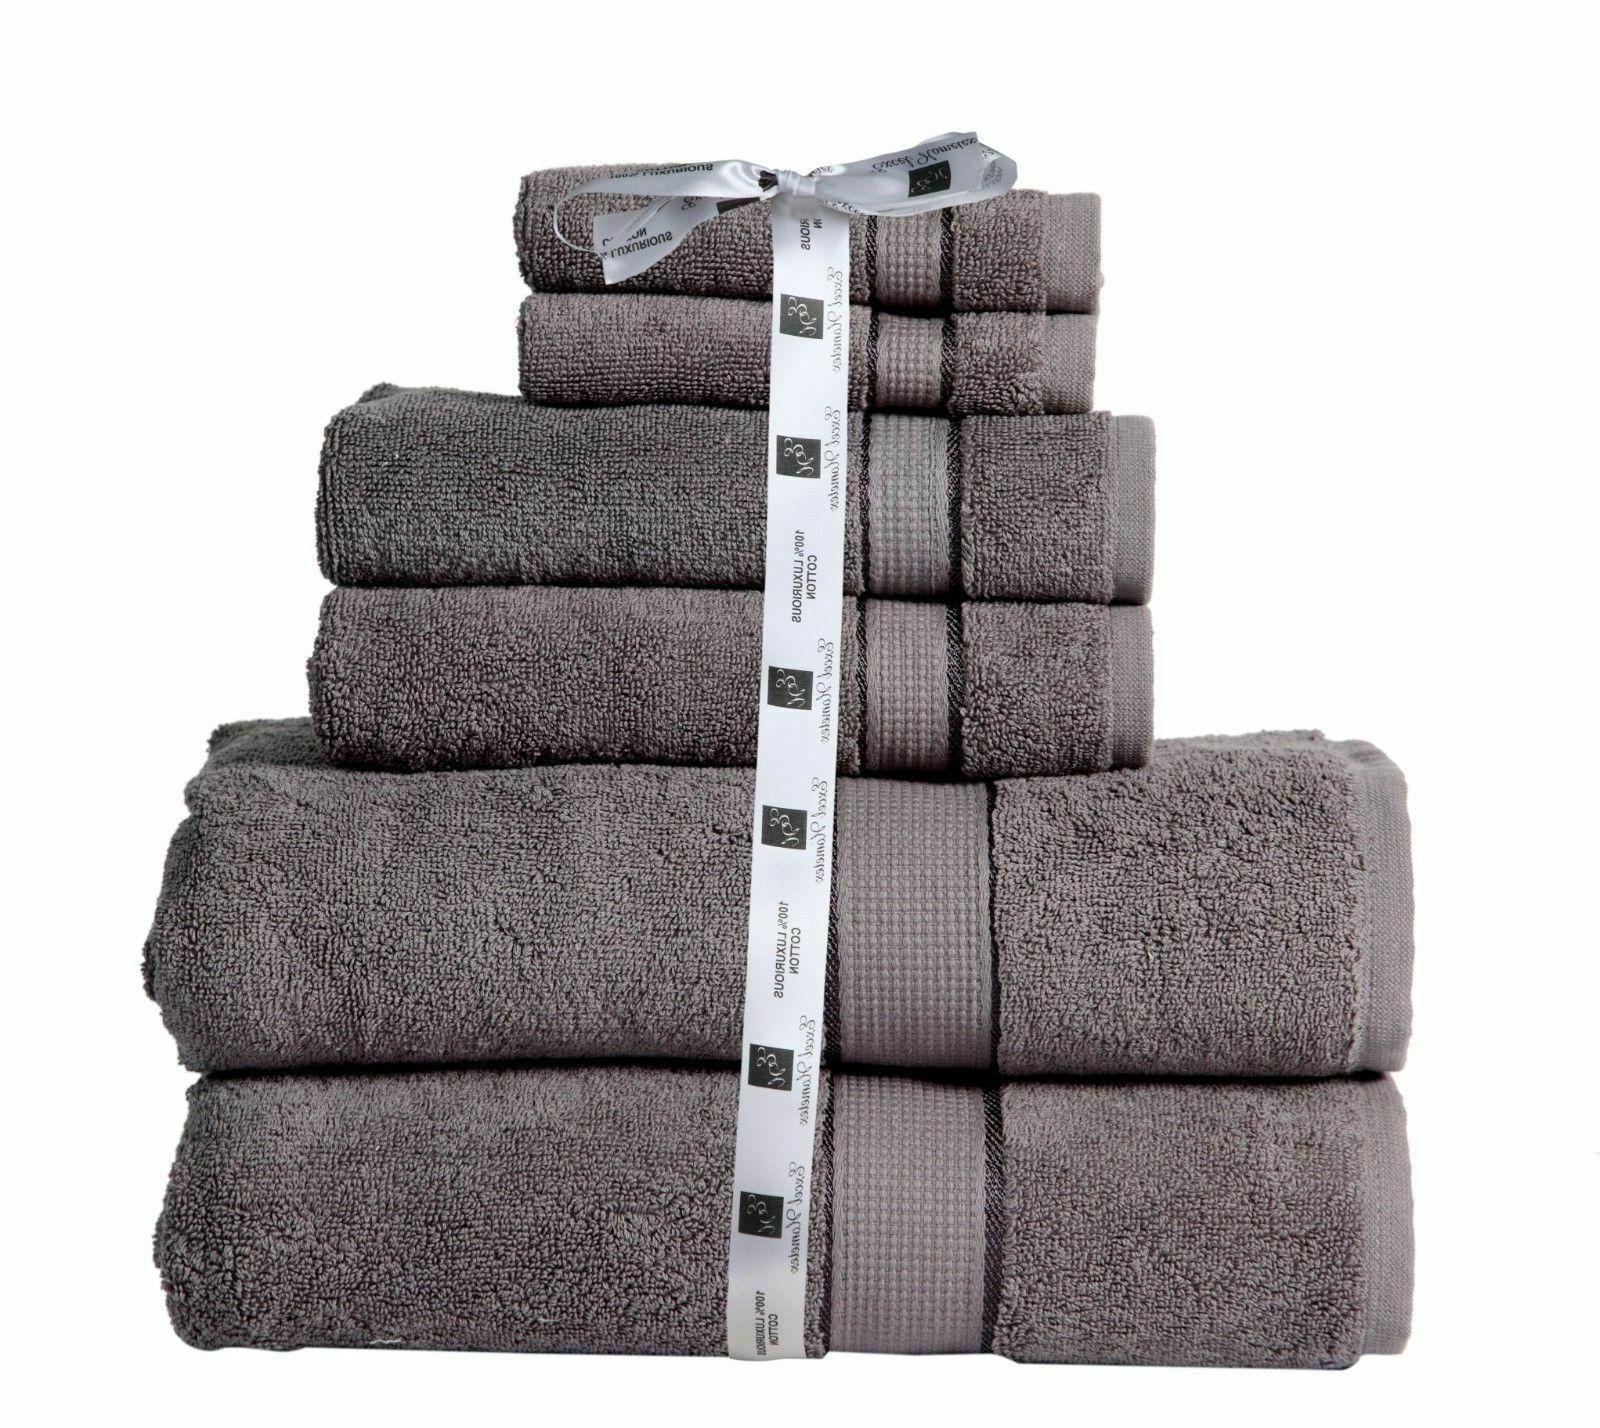 Towel Set Cotton 600 GSM- 2 Towel 2 Hand Towel Washcloth